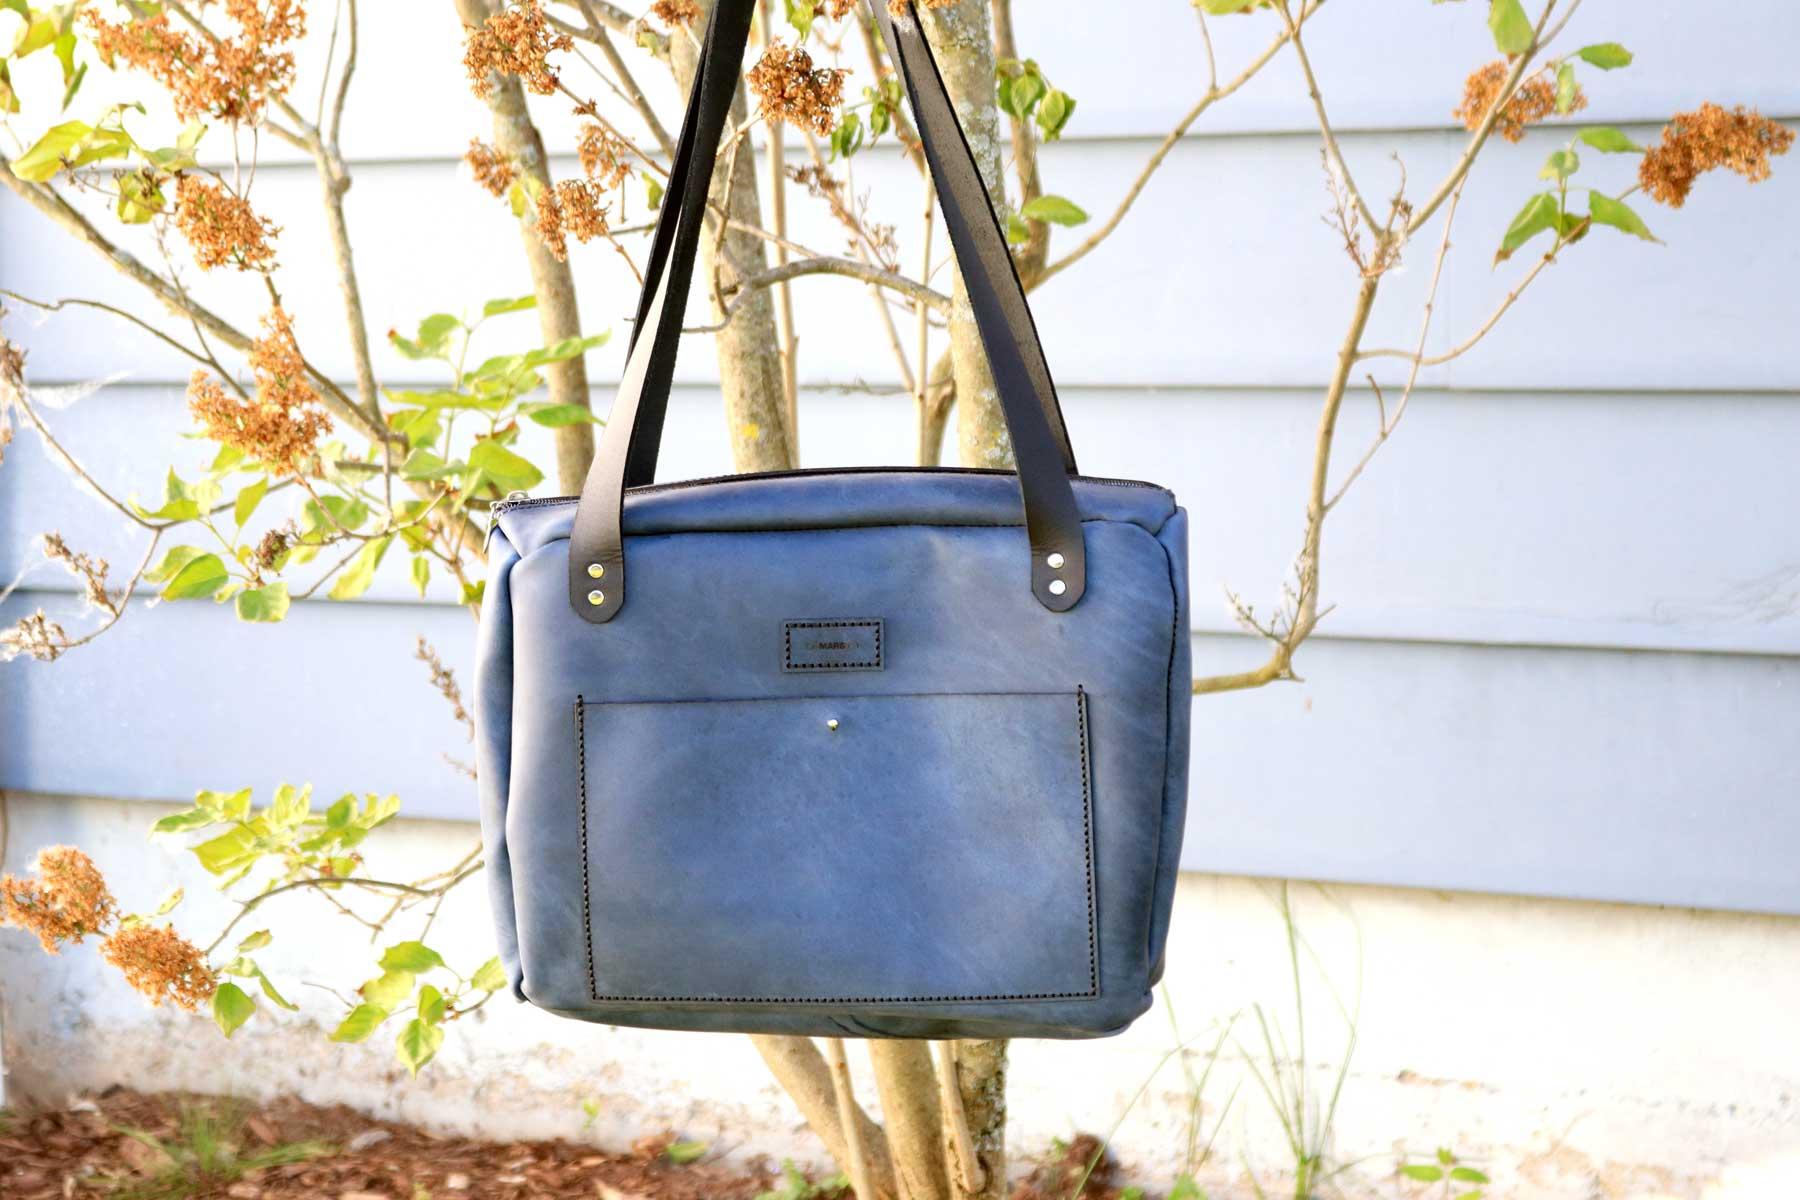 10_Mars-Everyday-Bag-With-Zipper-03.jpg